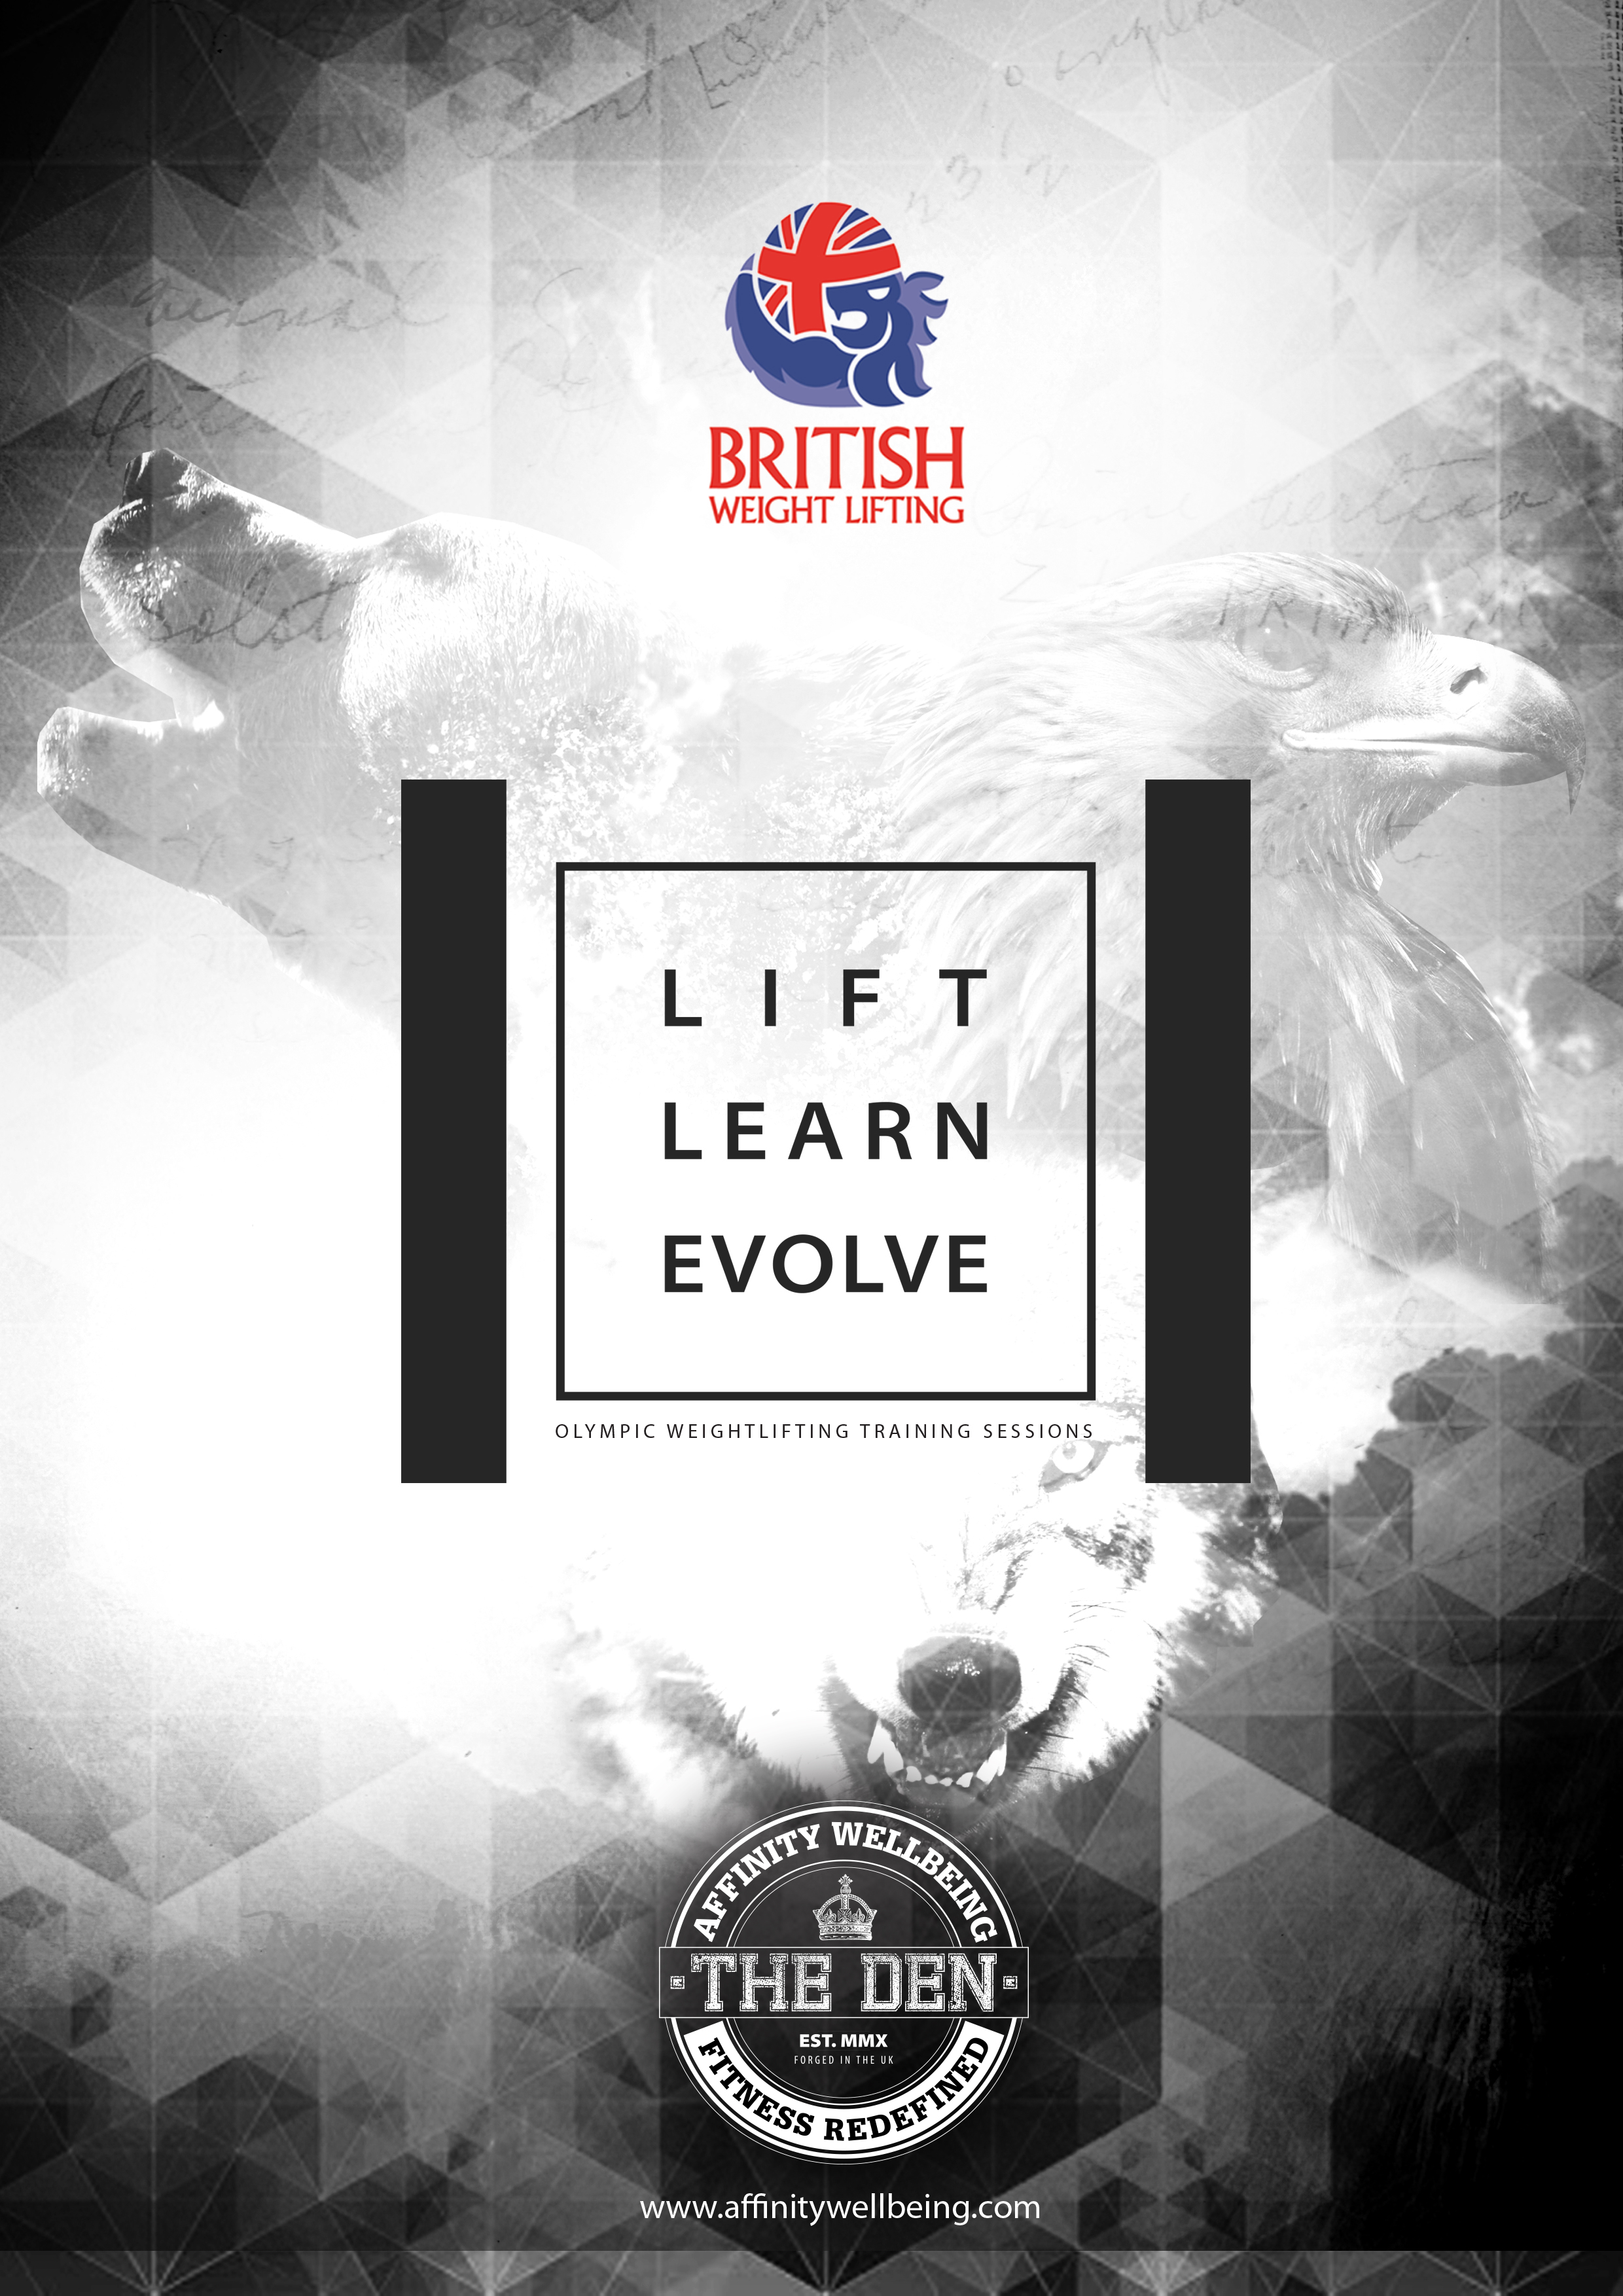 lift learn evolve